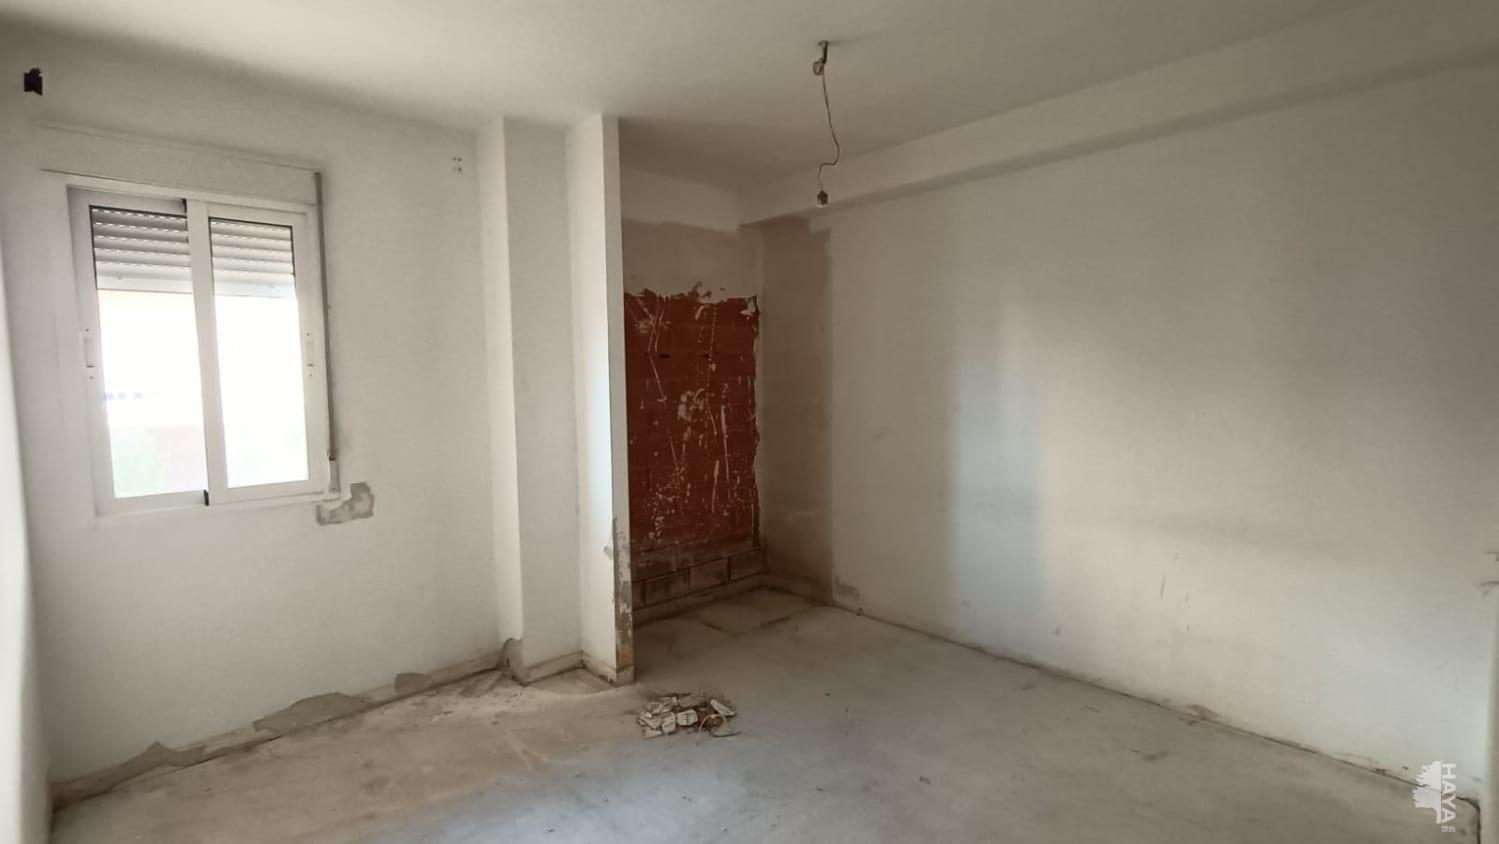 Piso en venta  en planta baja para reformar en avenida blasco ibañez, 46720, villalonga (v - imagenInmueble4